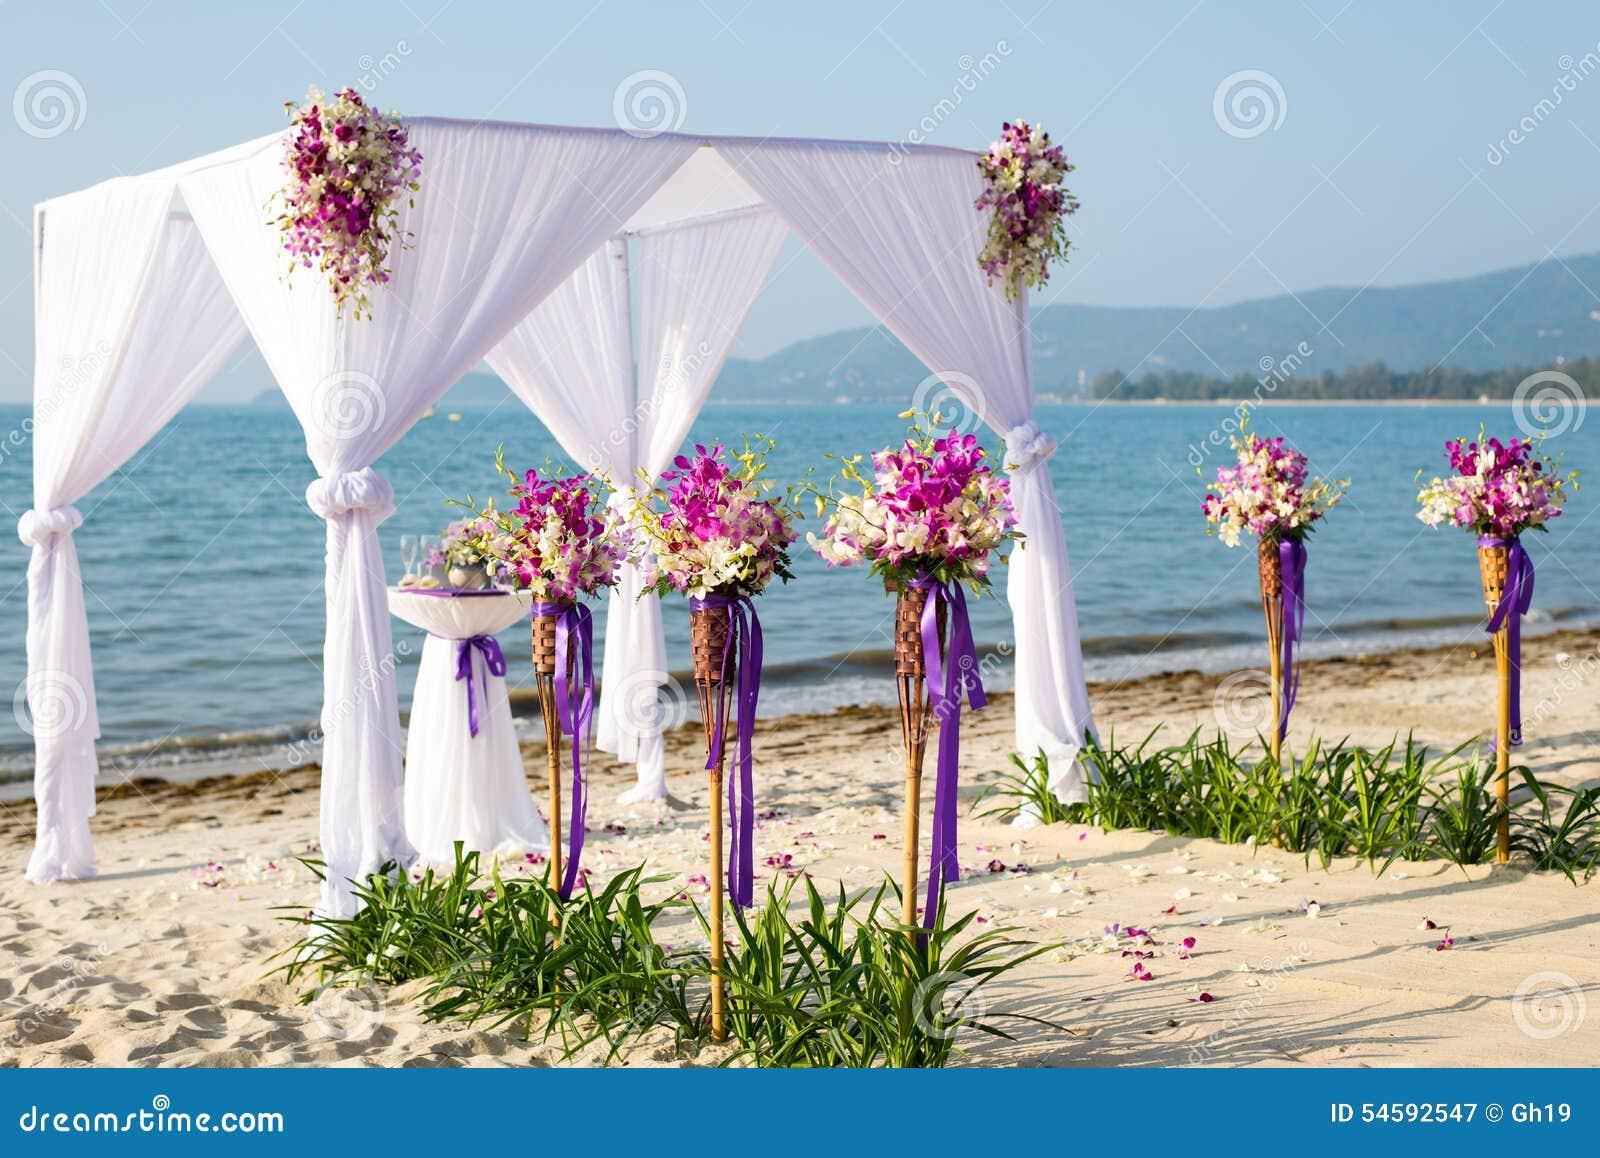 Beach Wedding Canopy Stock Image Image Of Outdoors